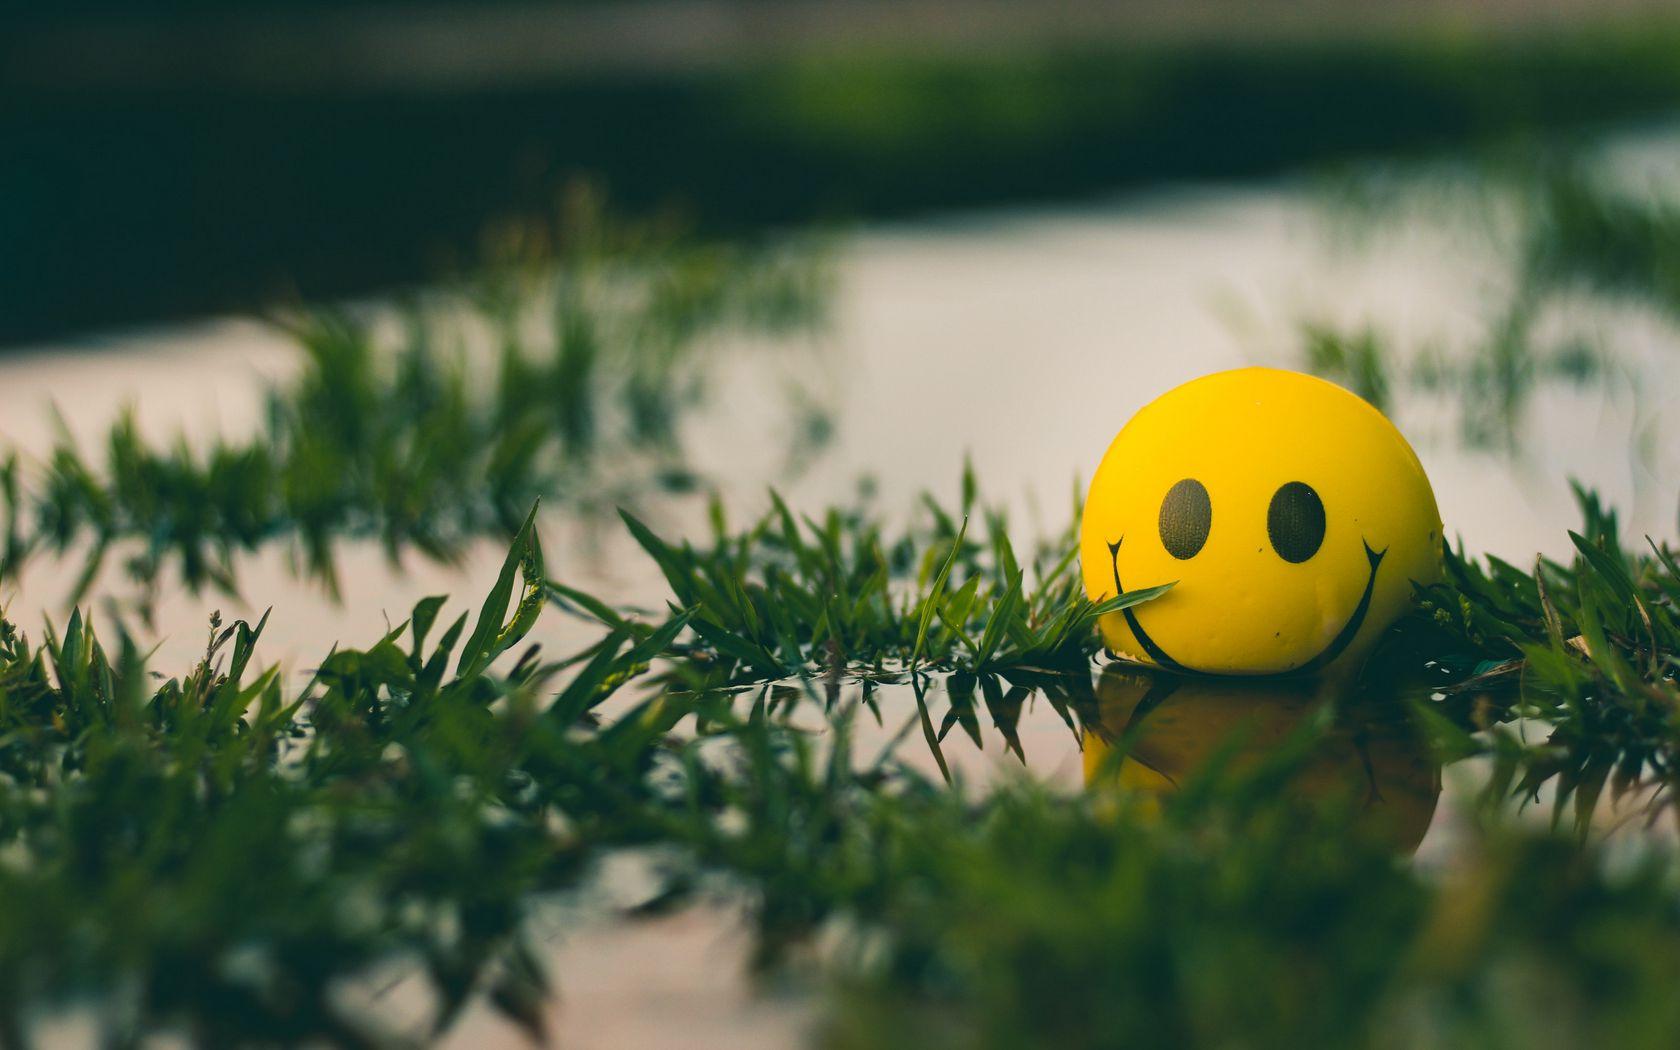 1680x1050 Wallpaper ball, smile, smiley, grass, water